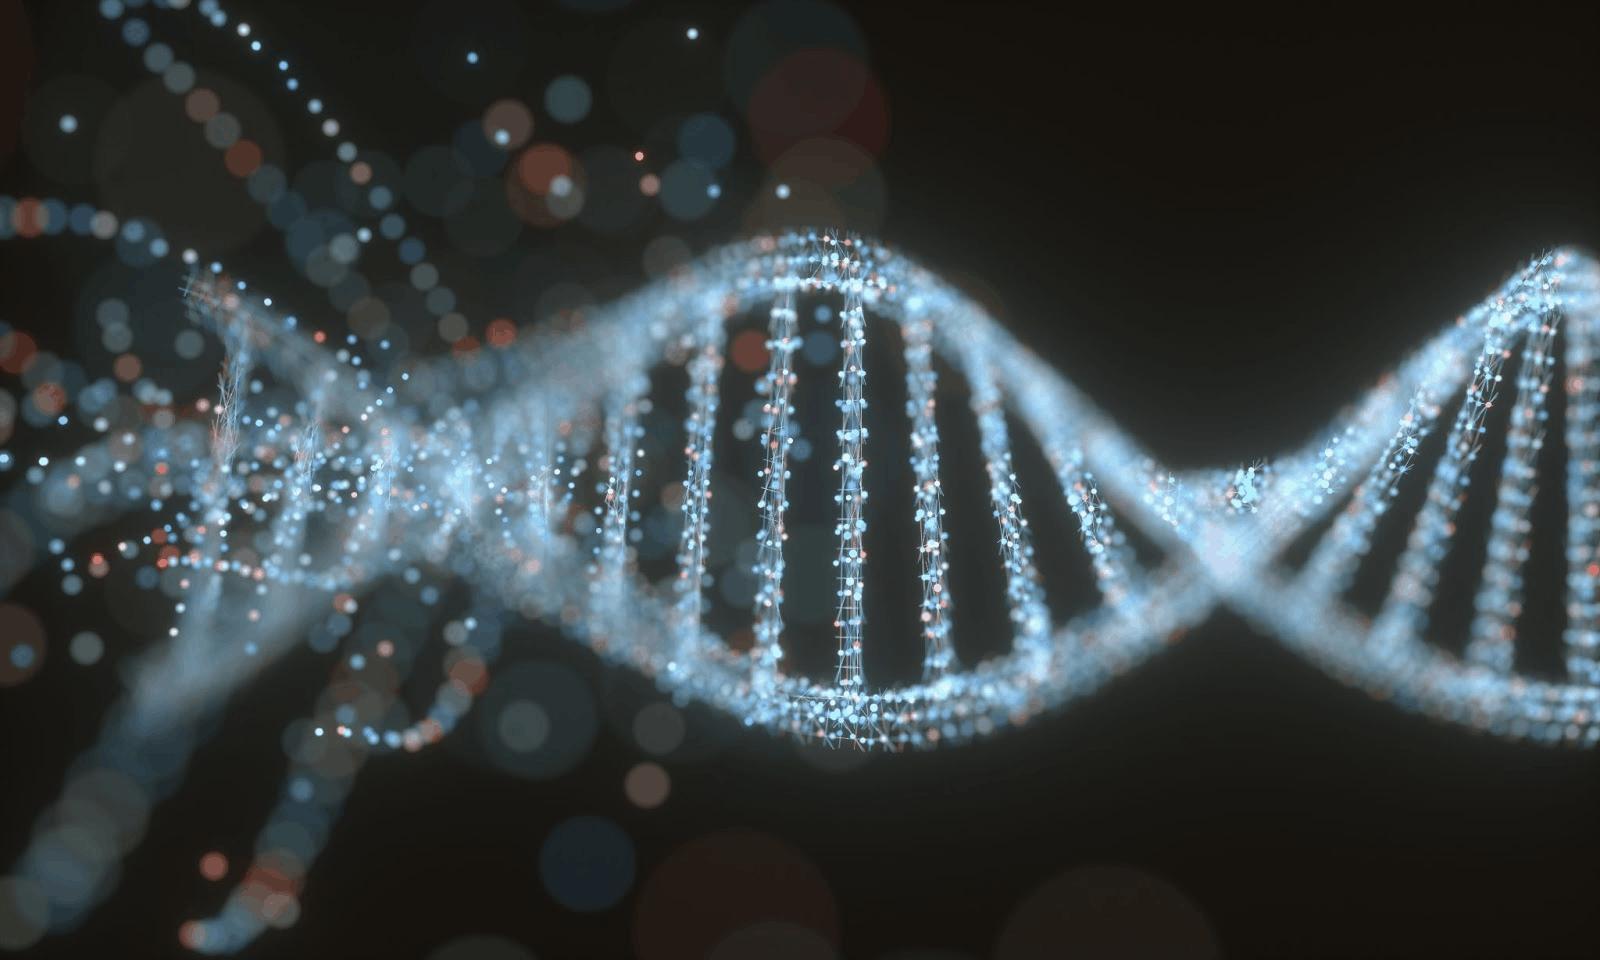 is hypothyroidism genetic: 3D illustration of a DNA molecule